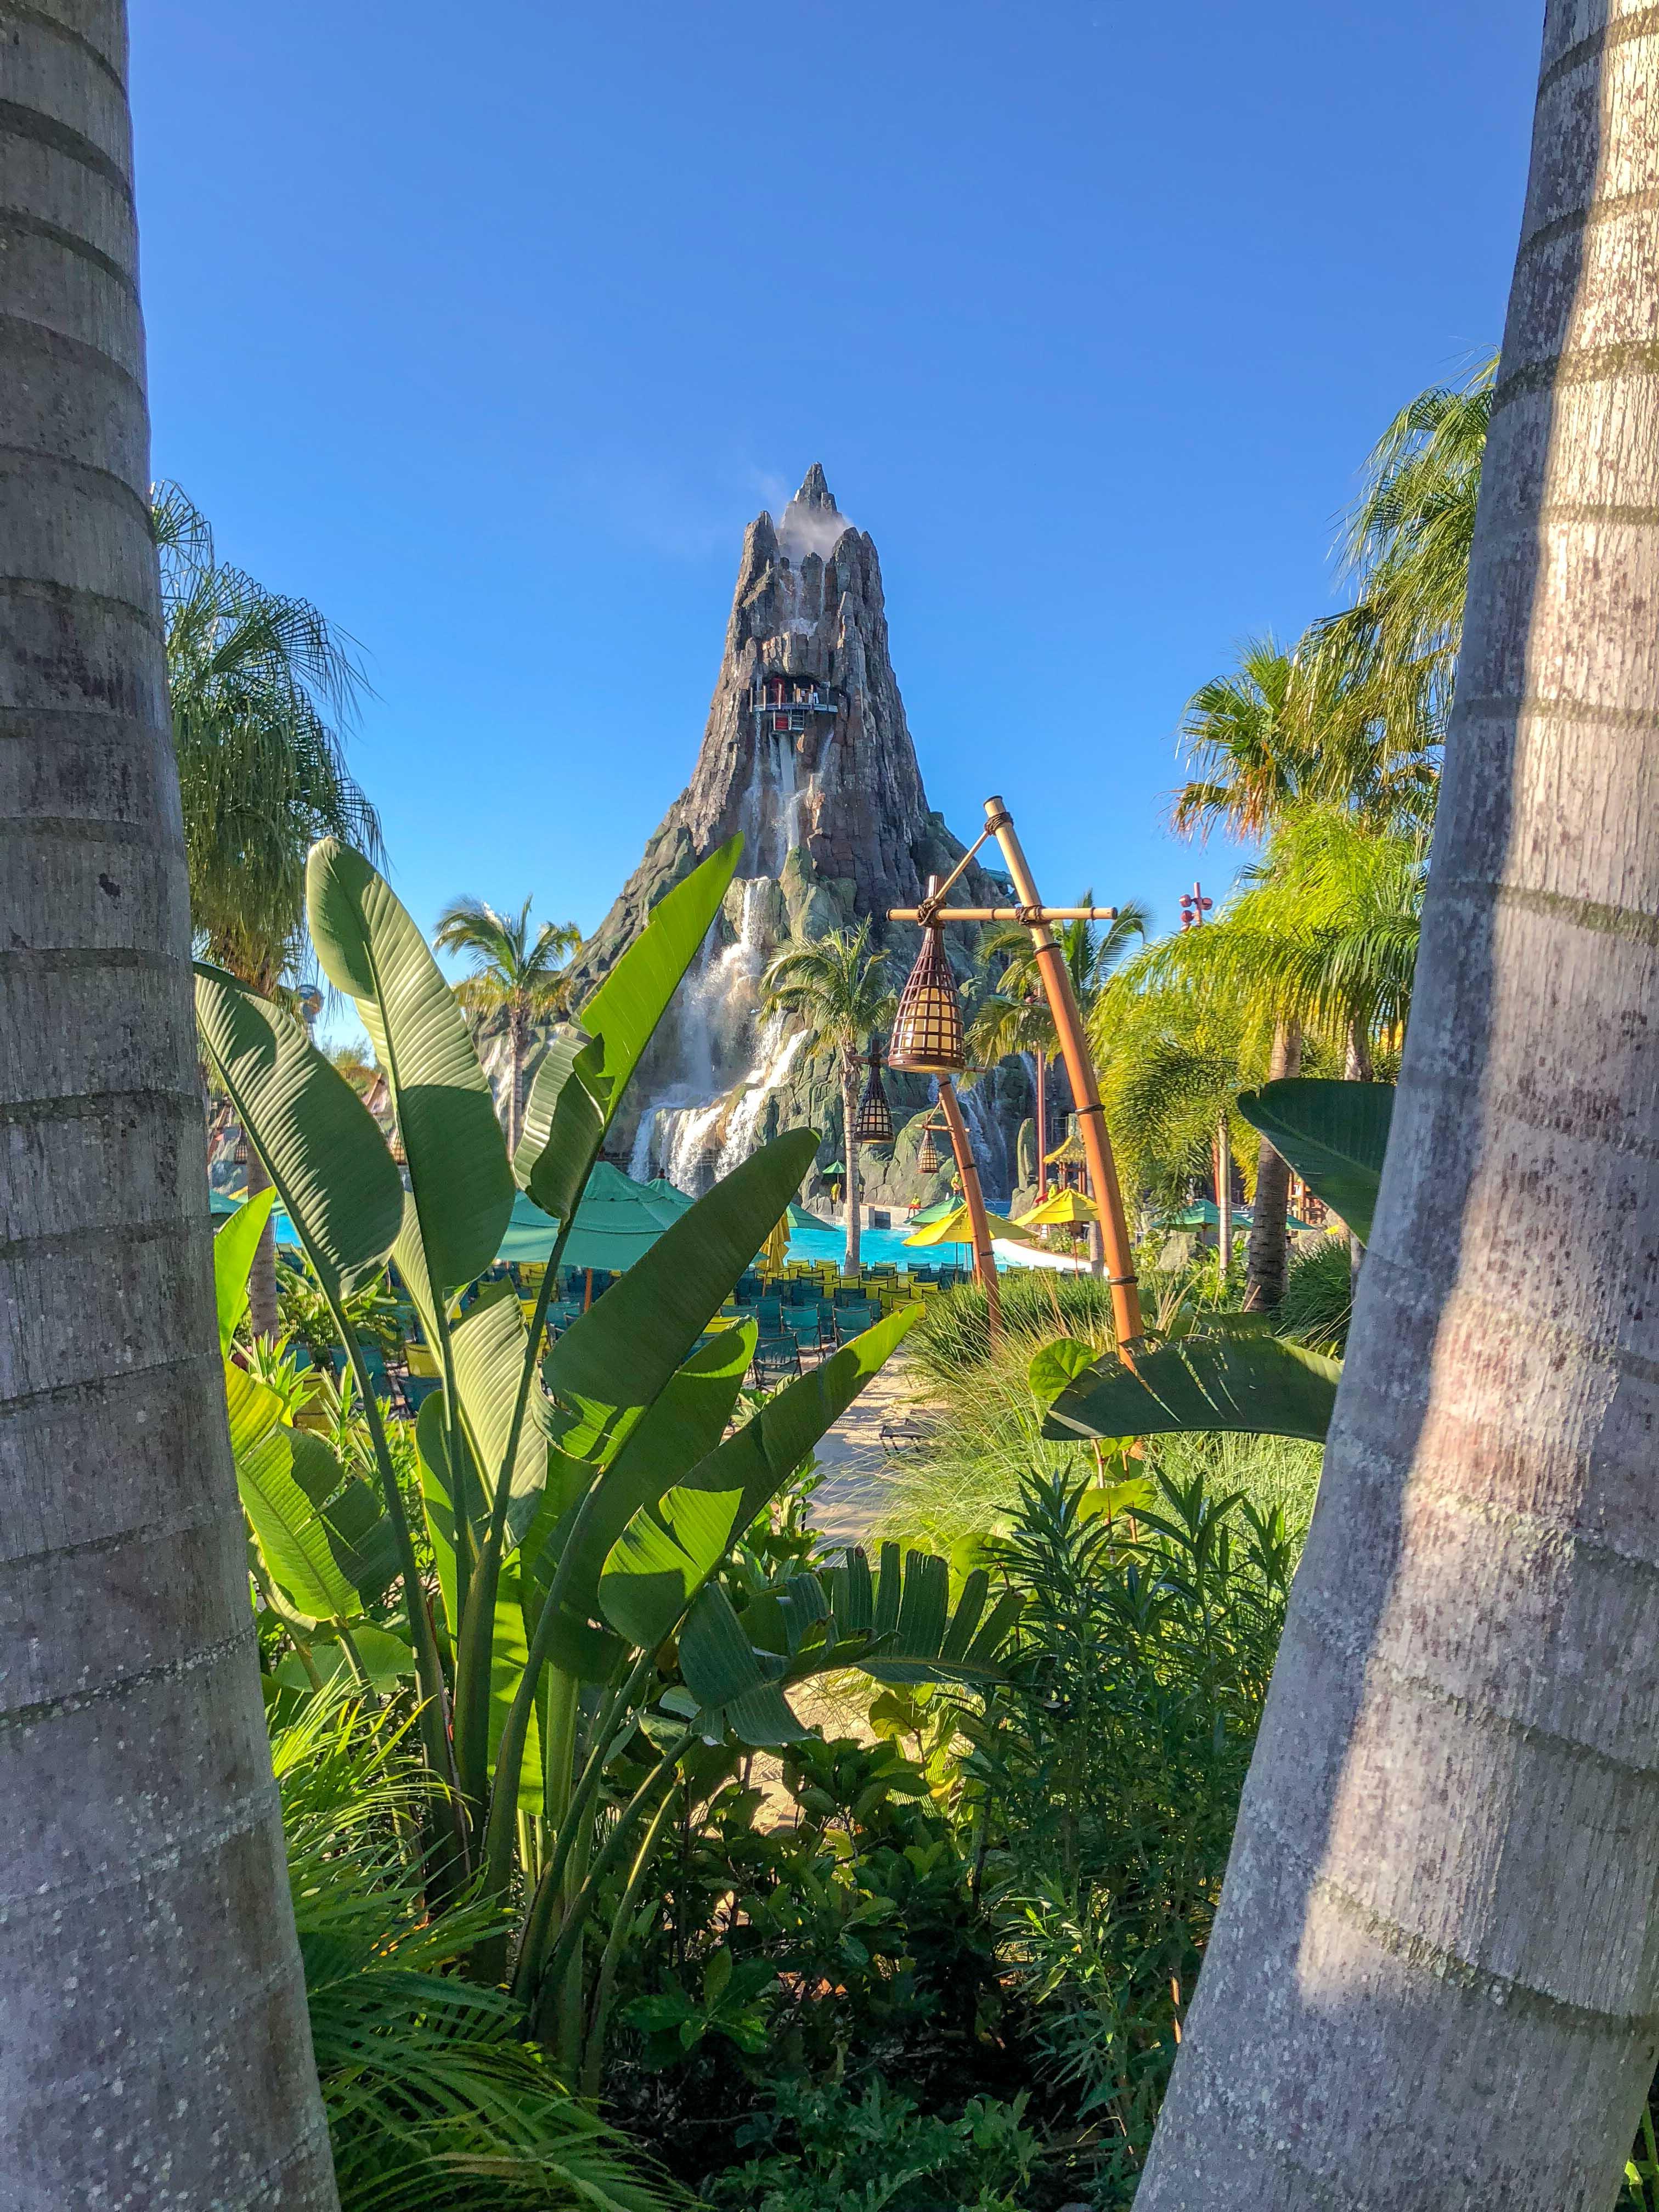 Krakatau Universal Volcano Bay Water Theme Park Orlando